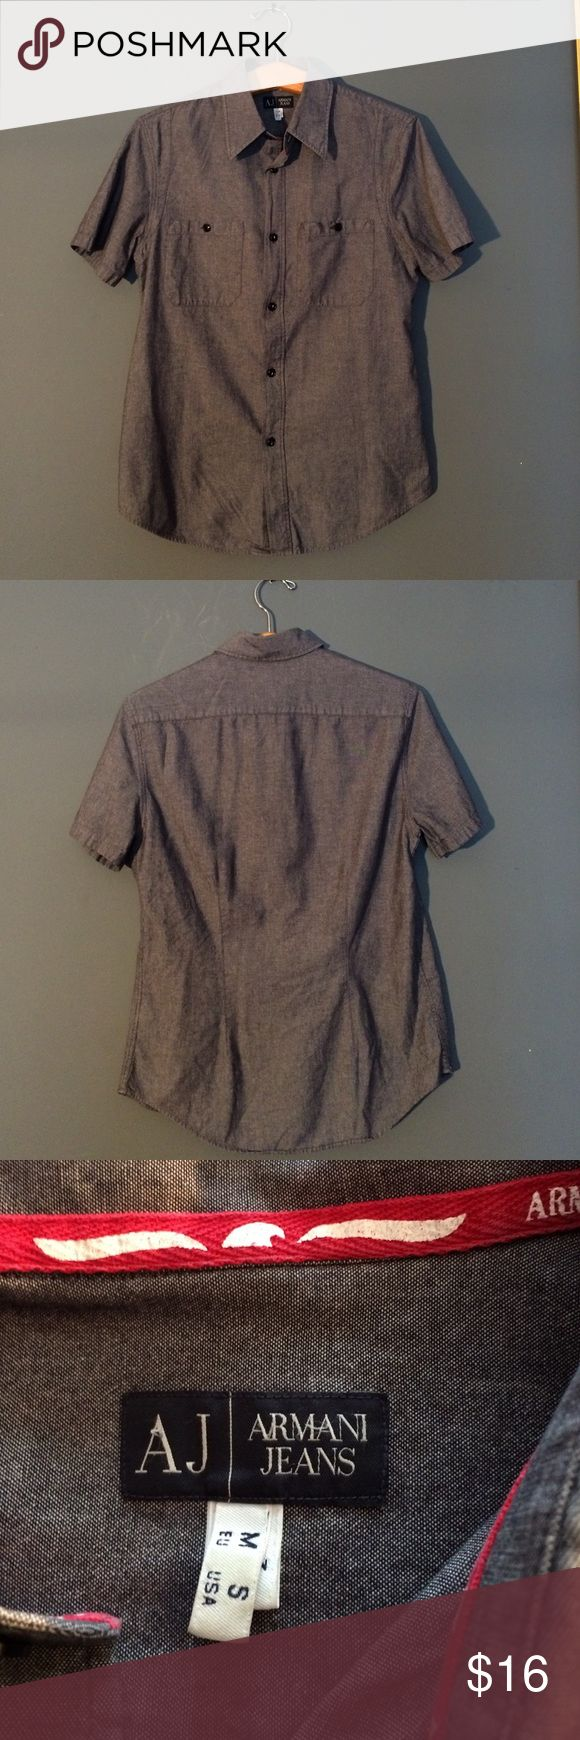 Armani jeans shirt size S 100% cotton gray Armani jeans shirt size S 100% cotton gray. In excellent condition Armani Jeans Shirts Casual Button Down Shirts